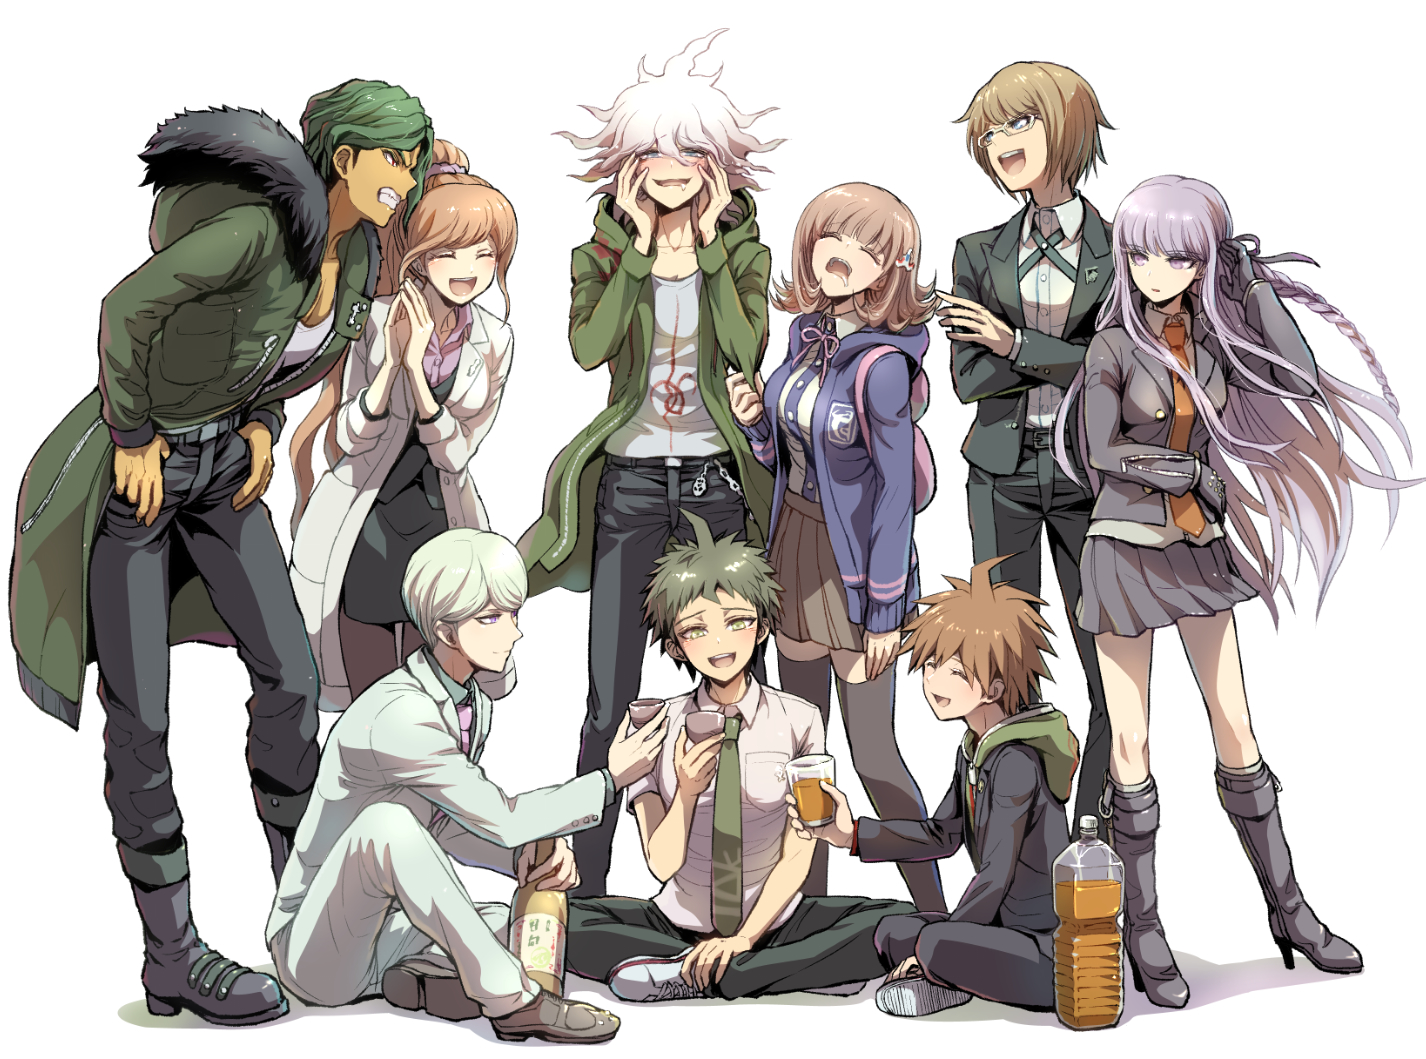 yukizome chisa fanart zerochan anime image board